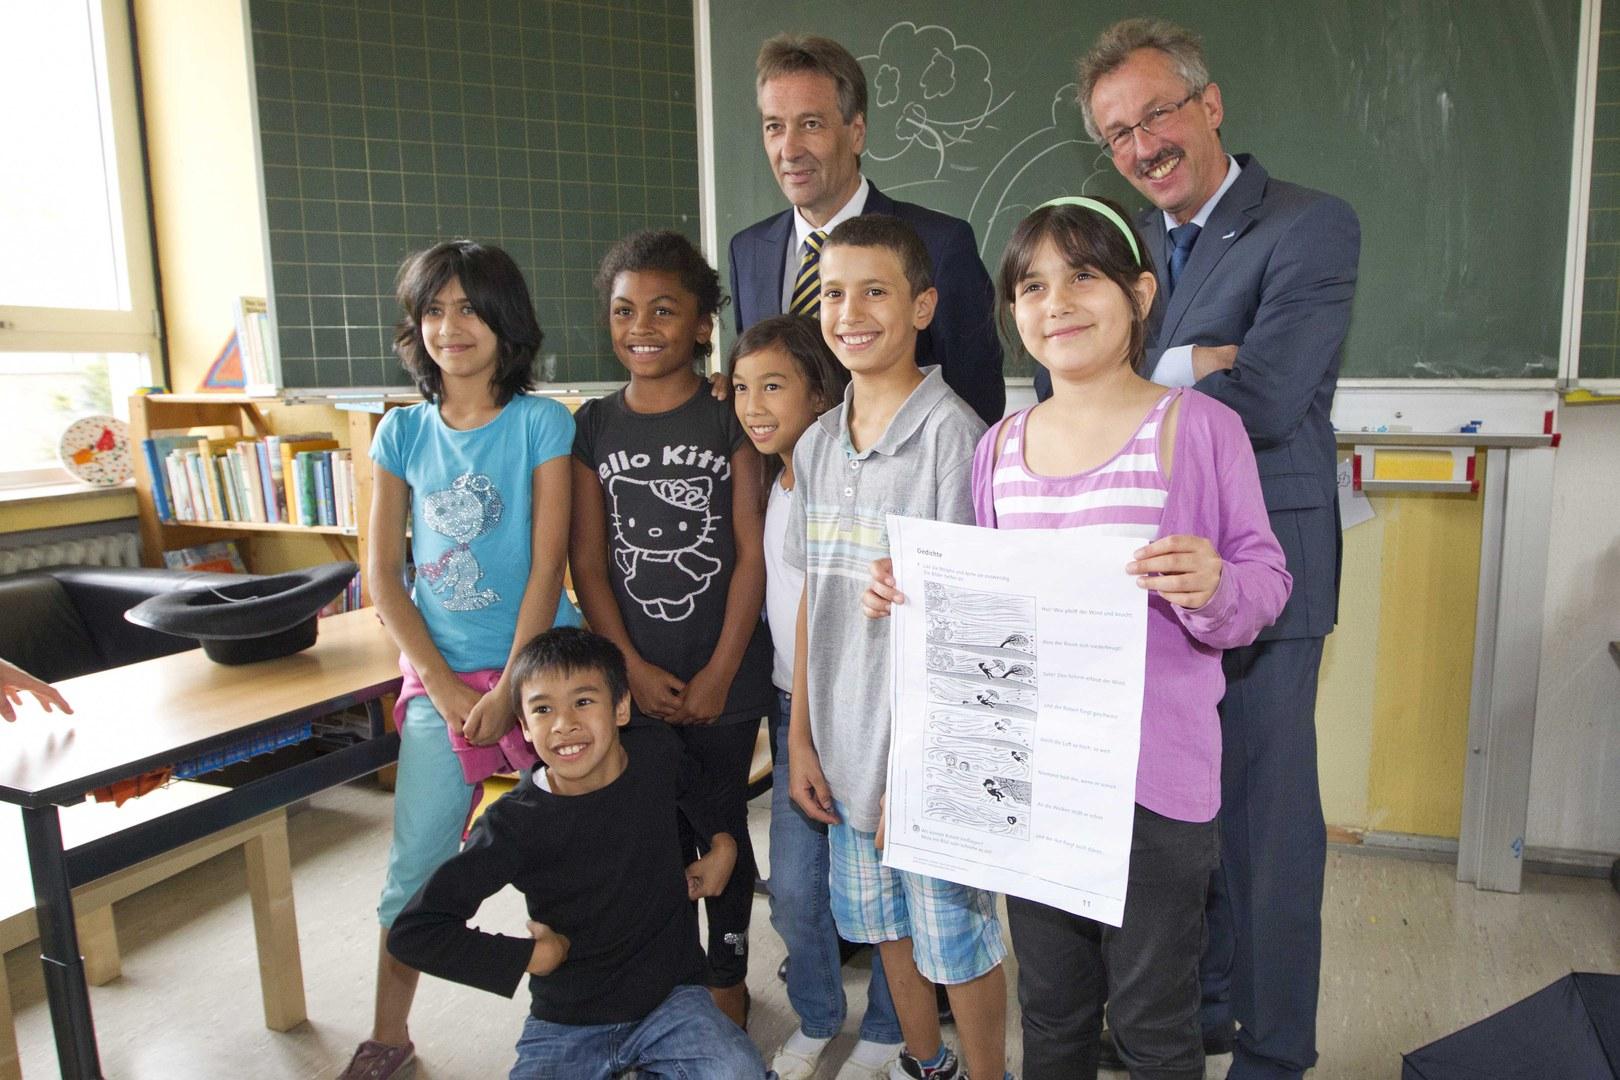 PK-Gotenschule-11-09-2012-03.jpg